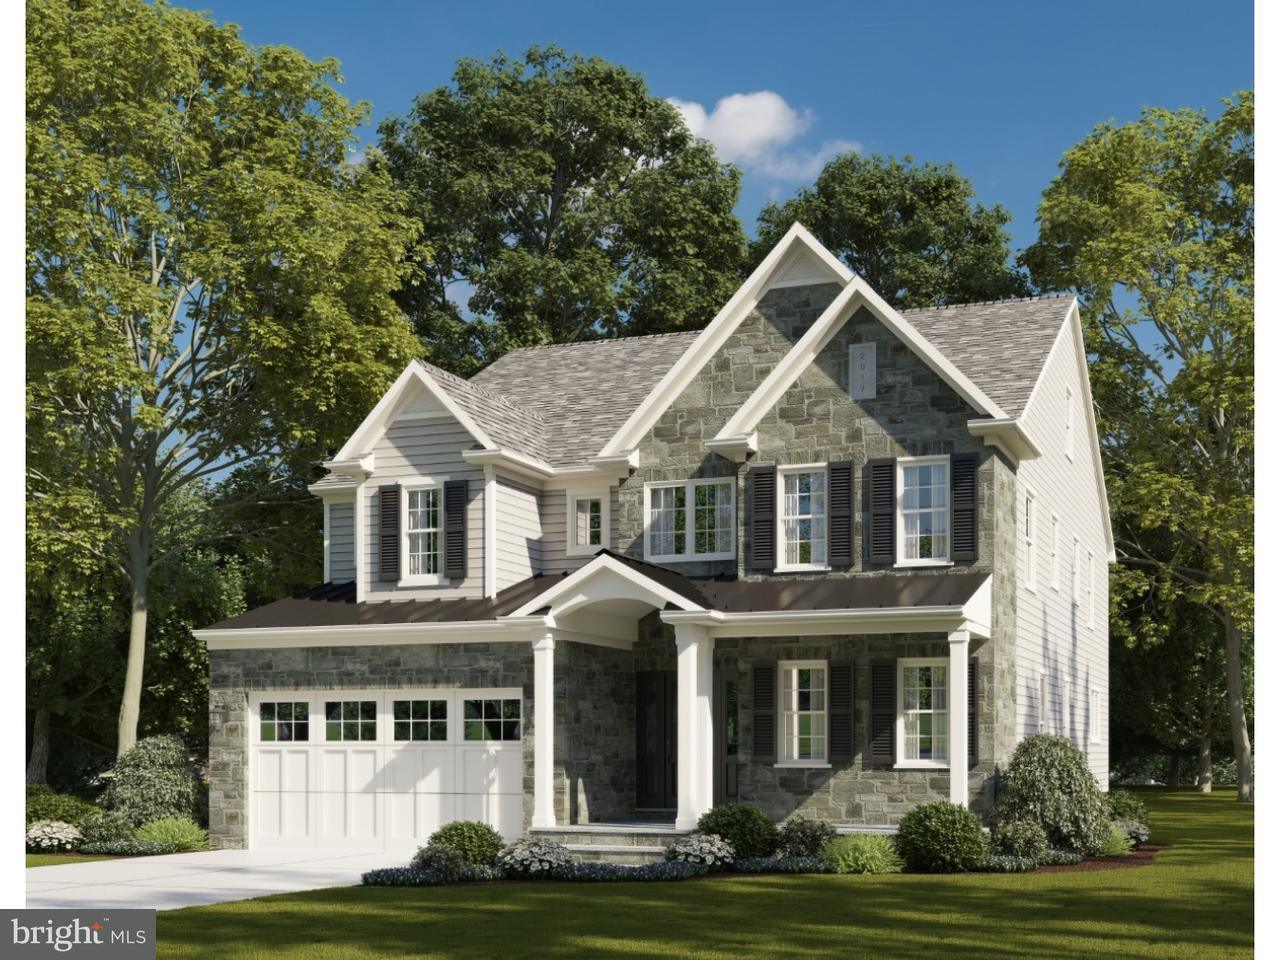 526  Manor Wynnewood, PA 19096